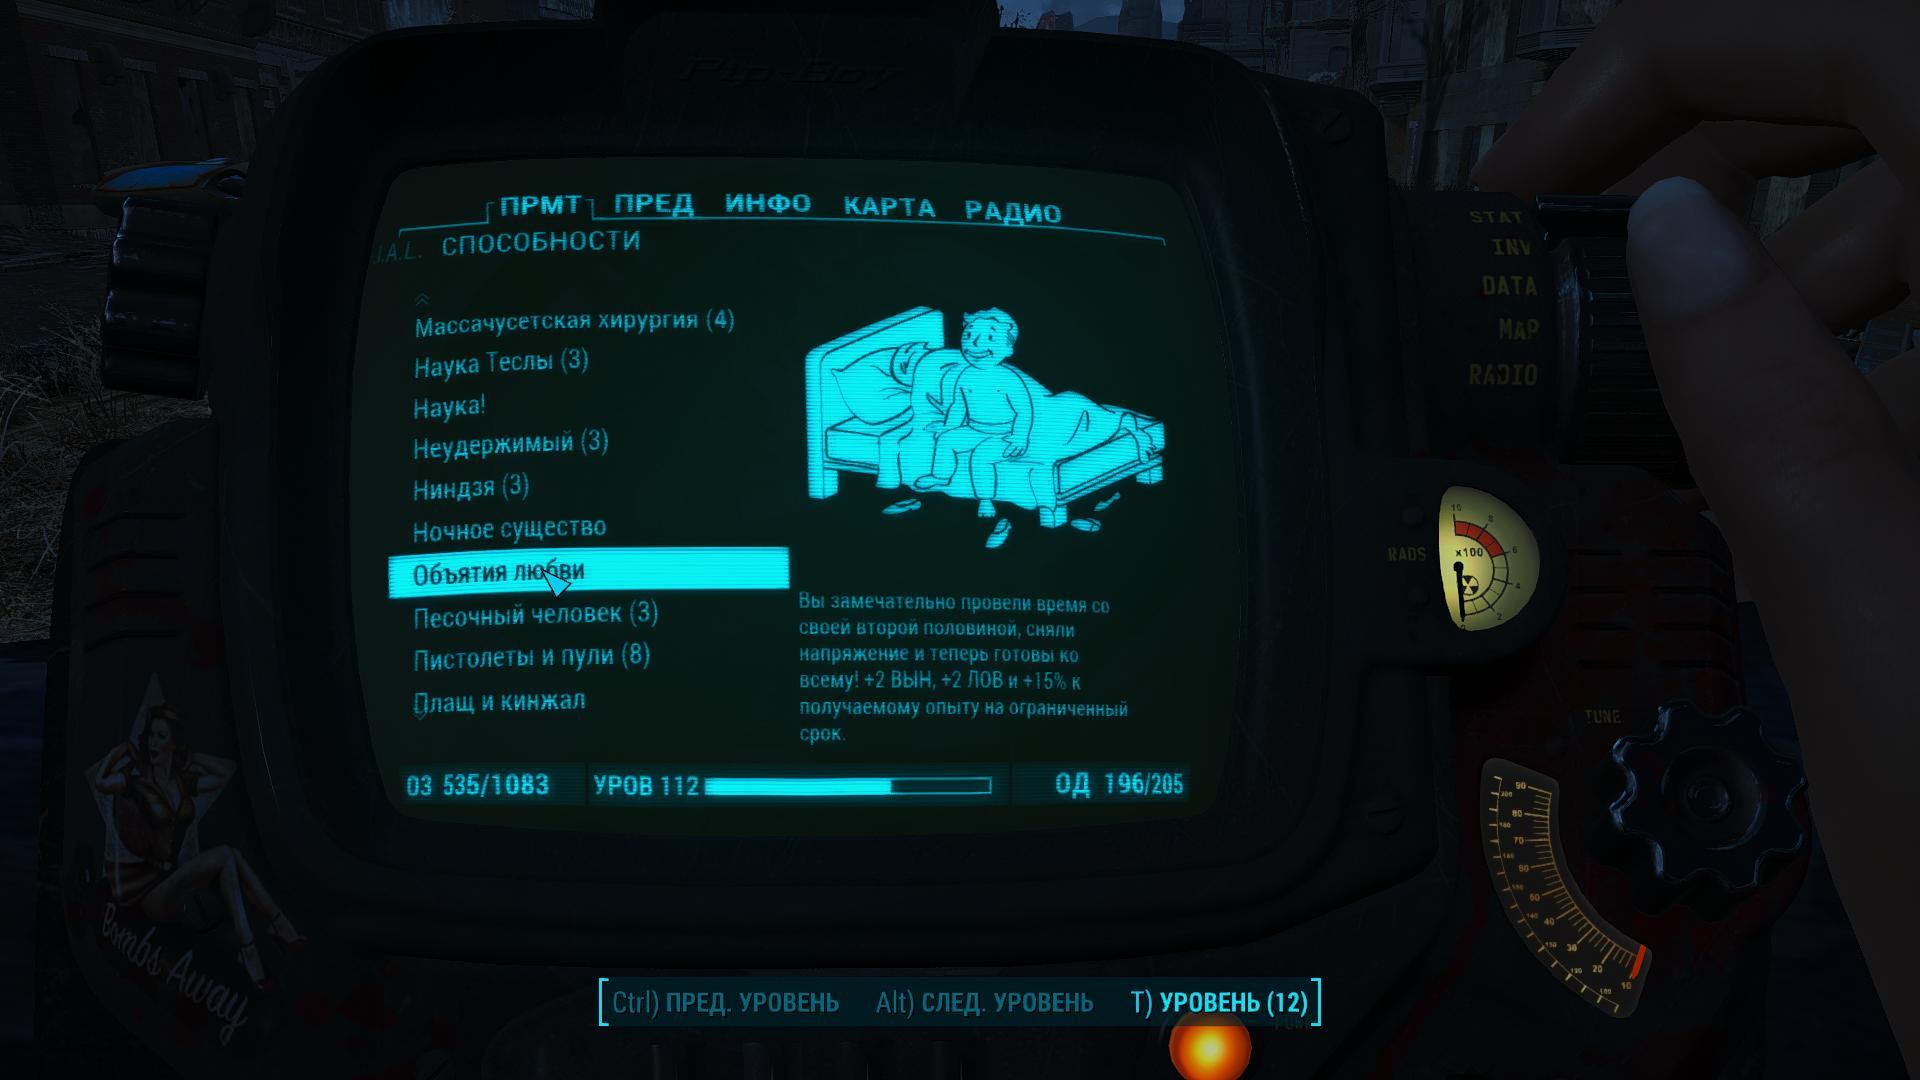 000564.Jpg - Fallout 4